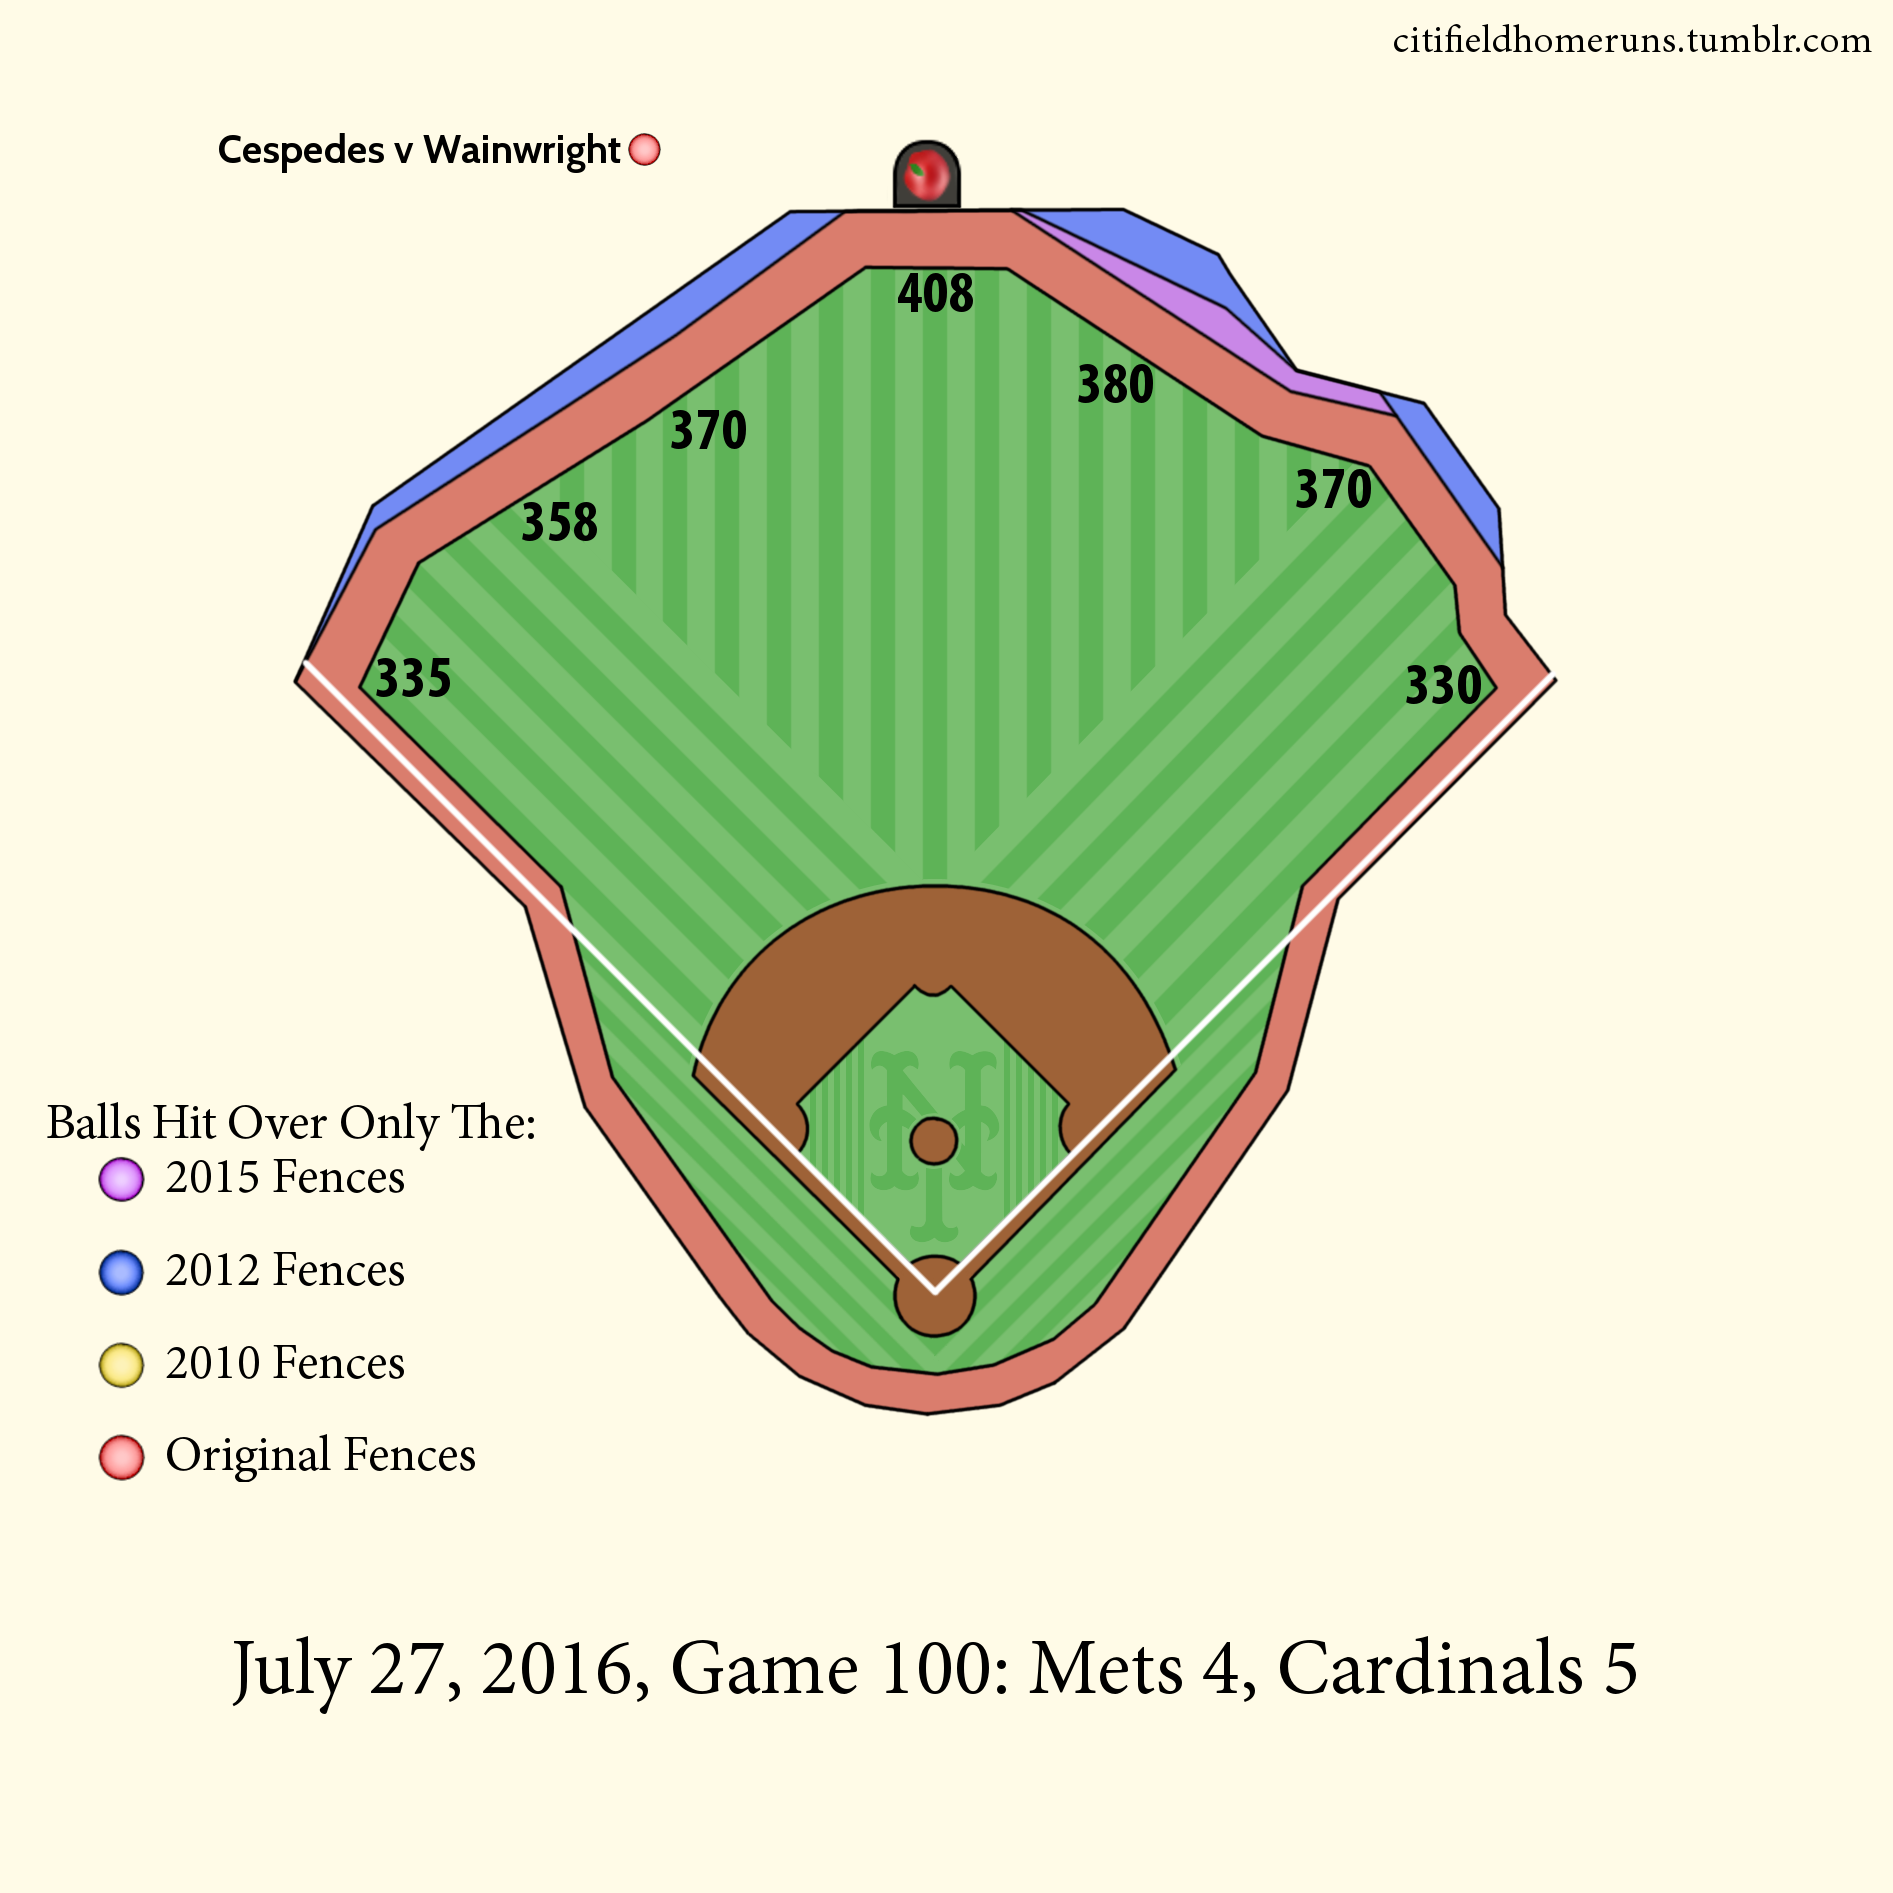 116. Cespedes v Wainwright: 2 Outs, 3-2 Curveball, 2 Runs.